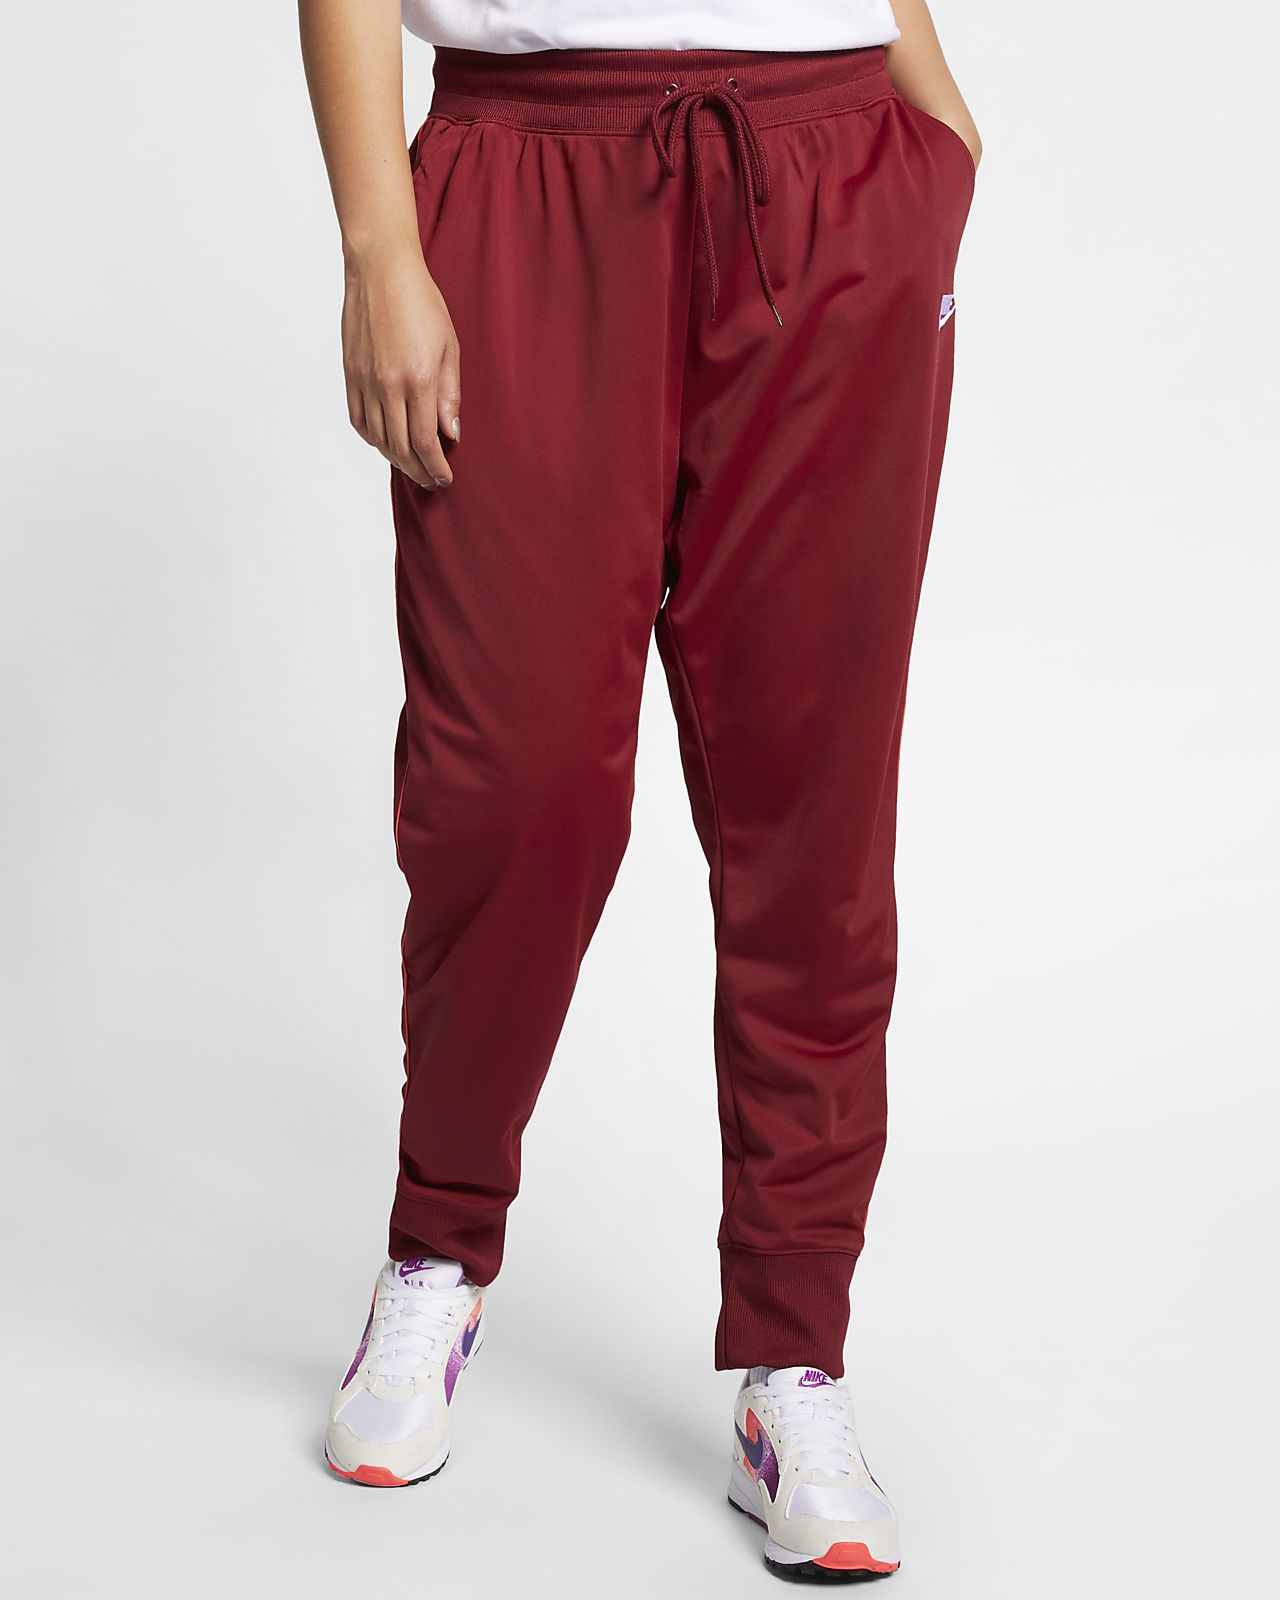 39b3df709c76 ... Γυναικείο παντελόνι φόρμας Nike Sportswear Heritage (μεγάλα μεγέθη)